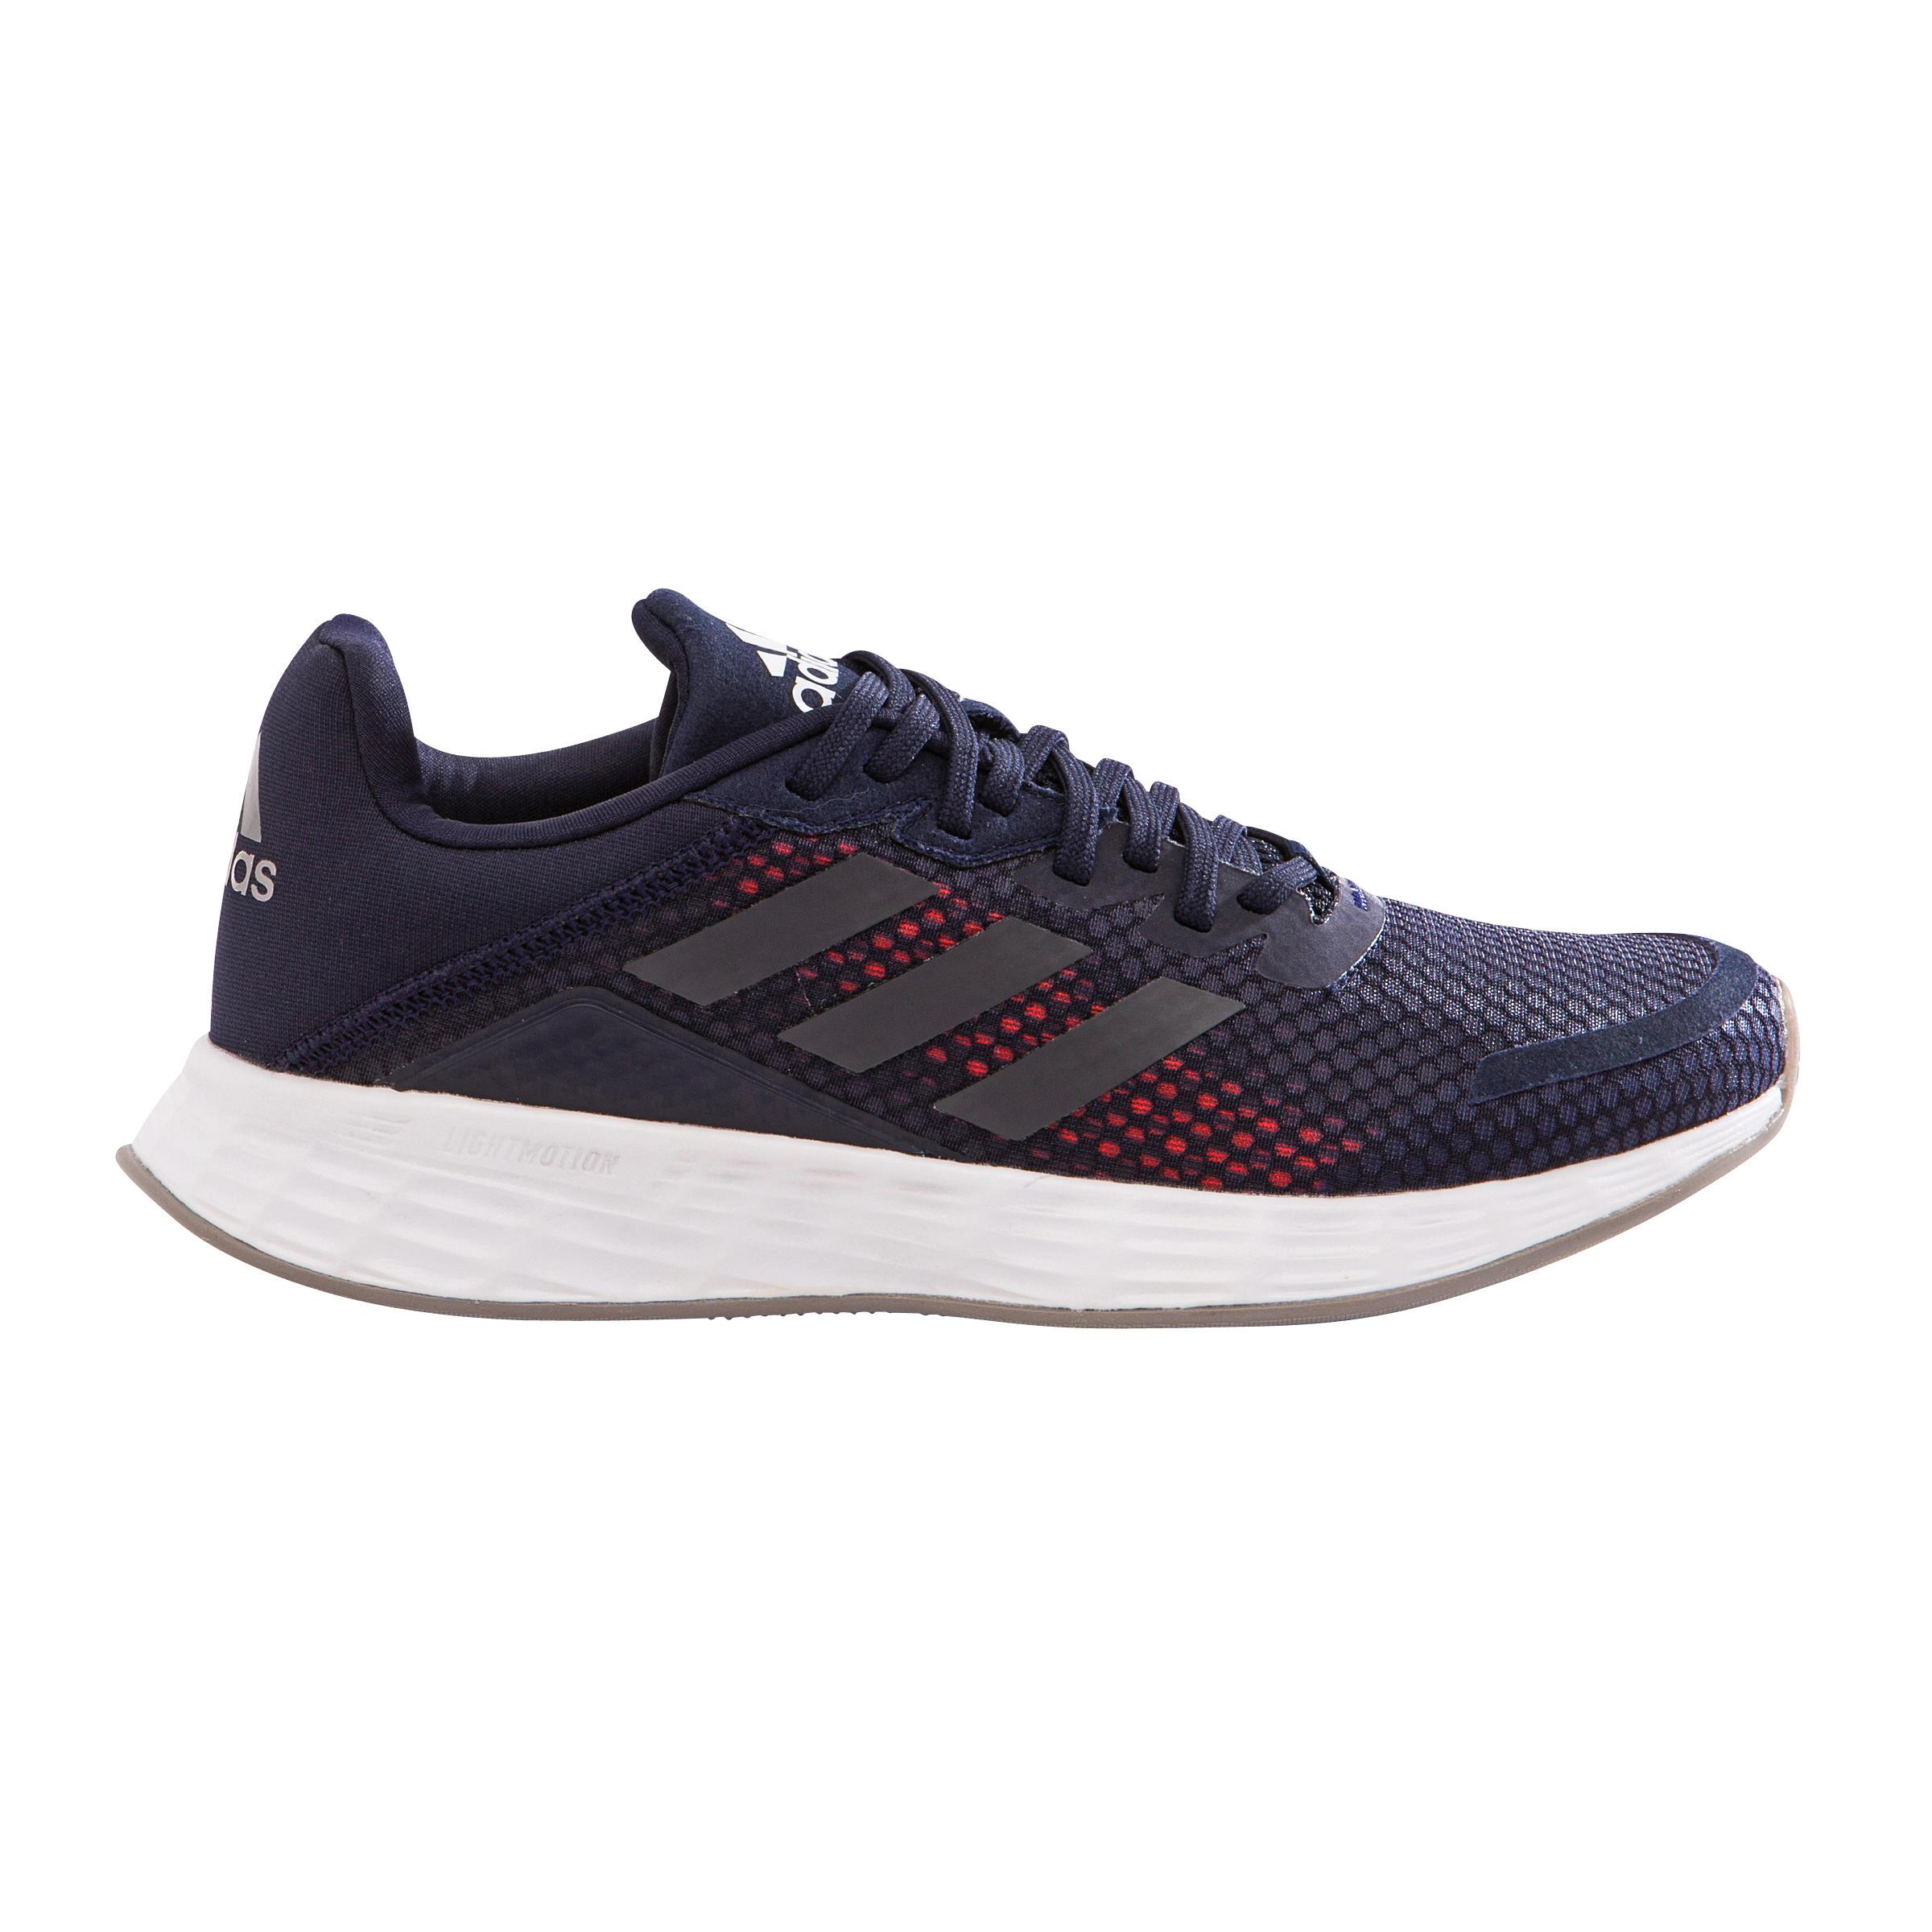 Running Shoes navy blue ADIDAS - Decathlon